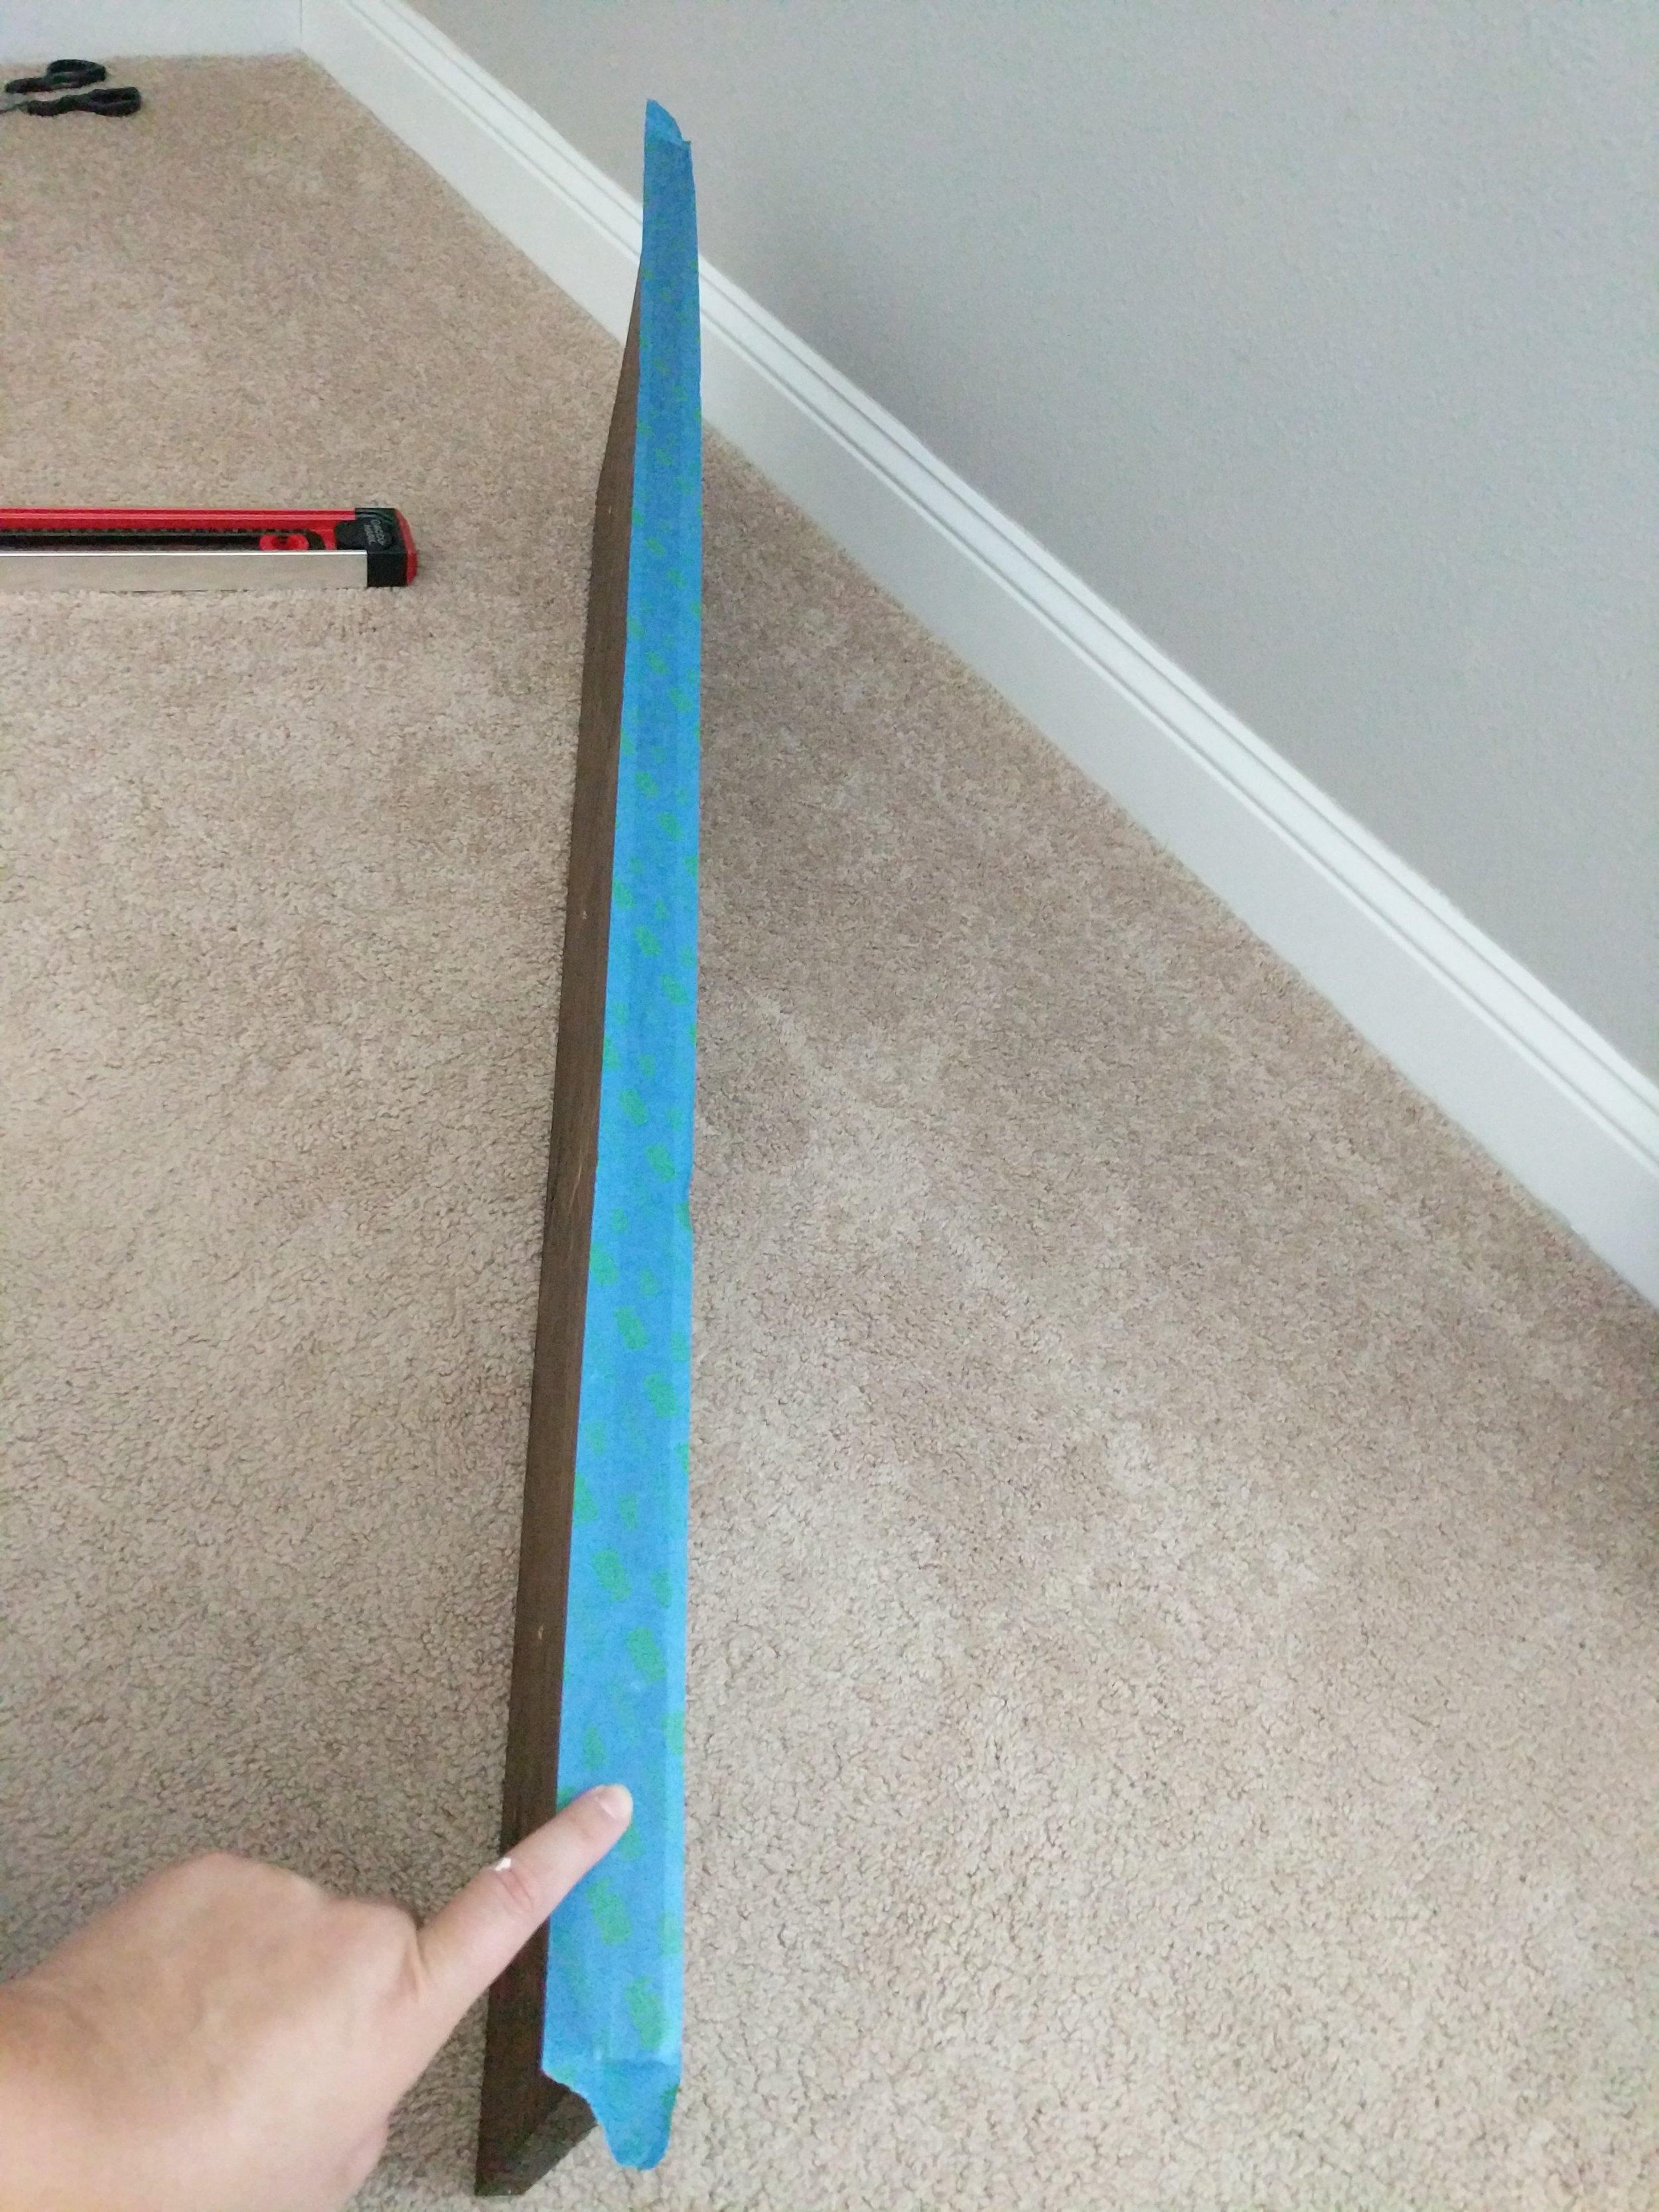 1. Add painters tape to shelf